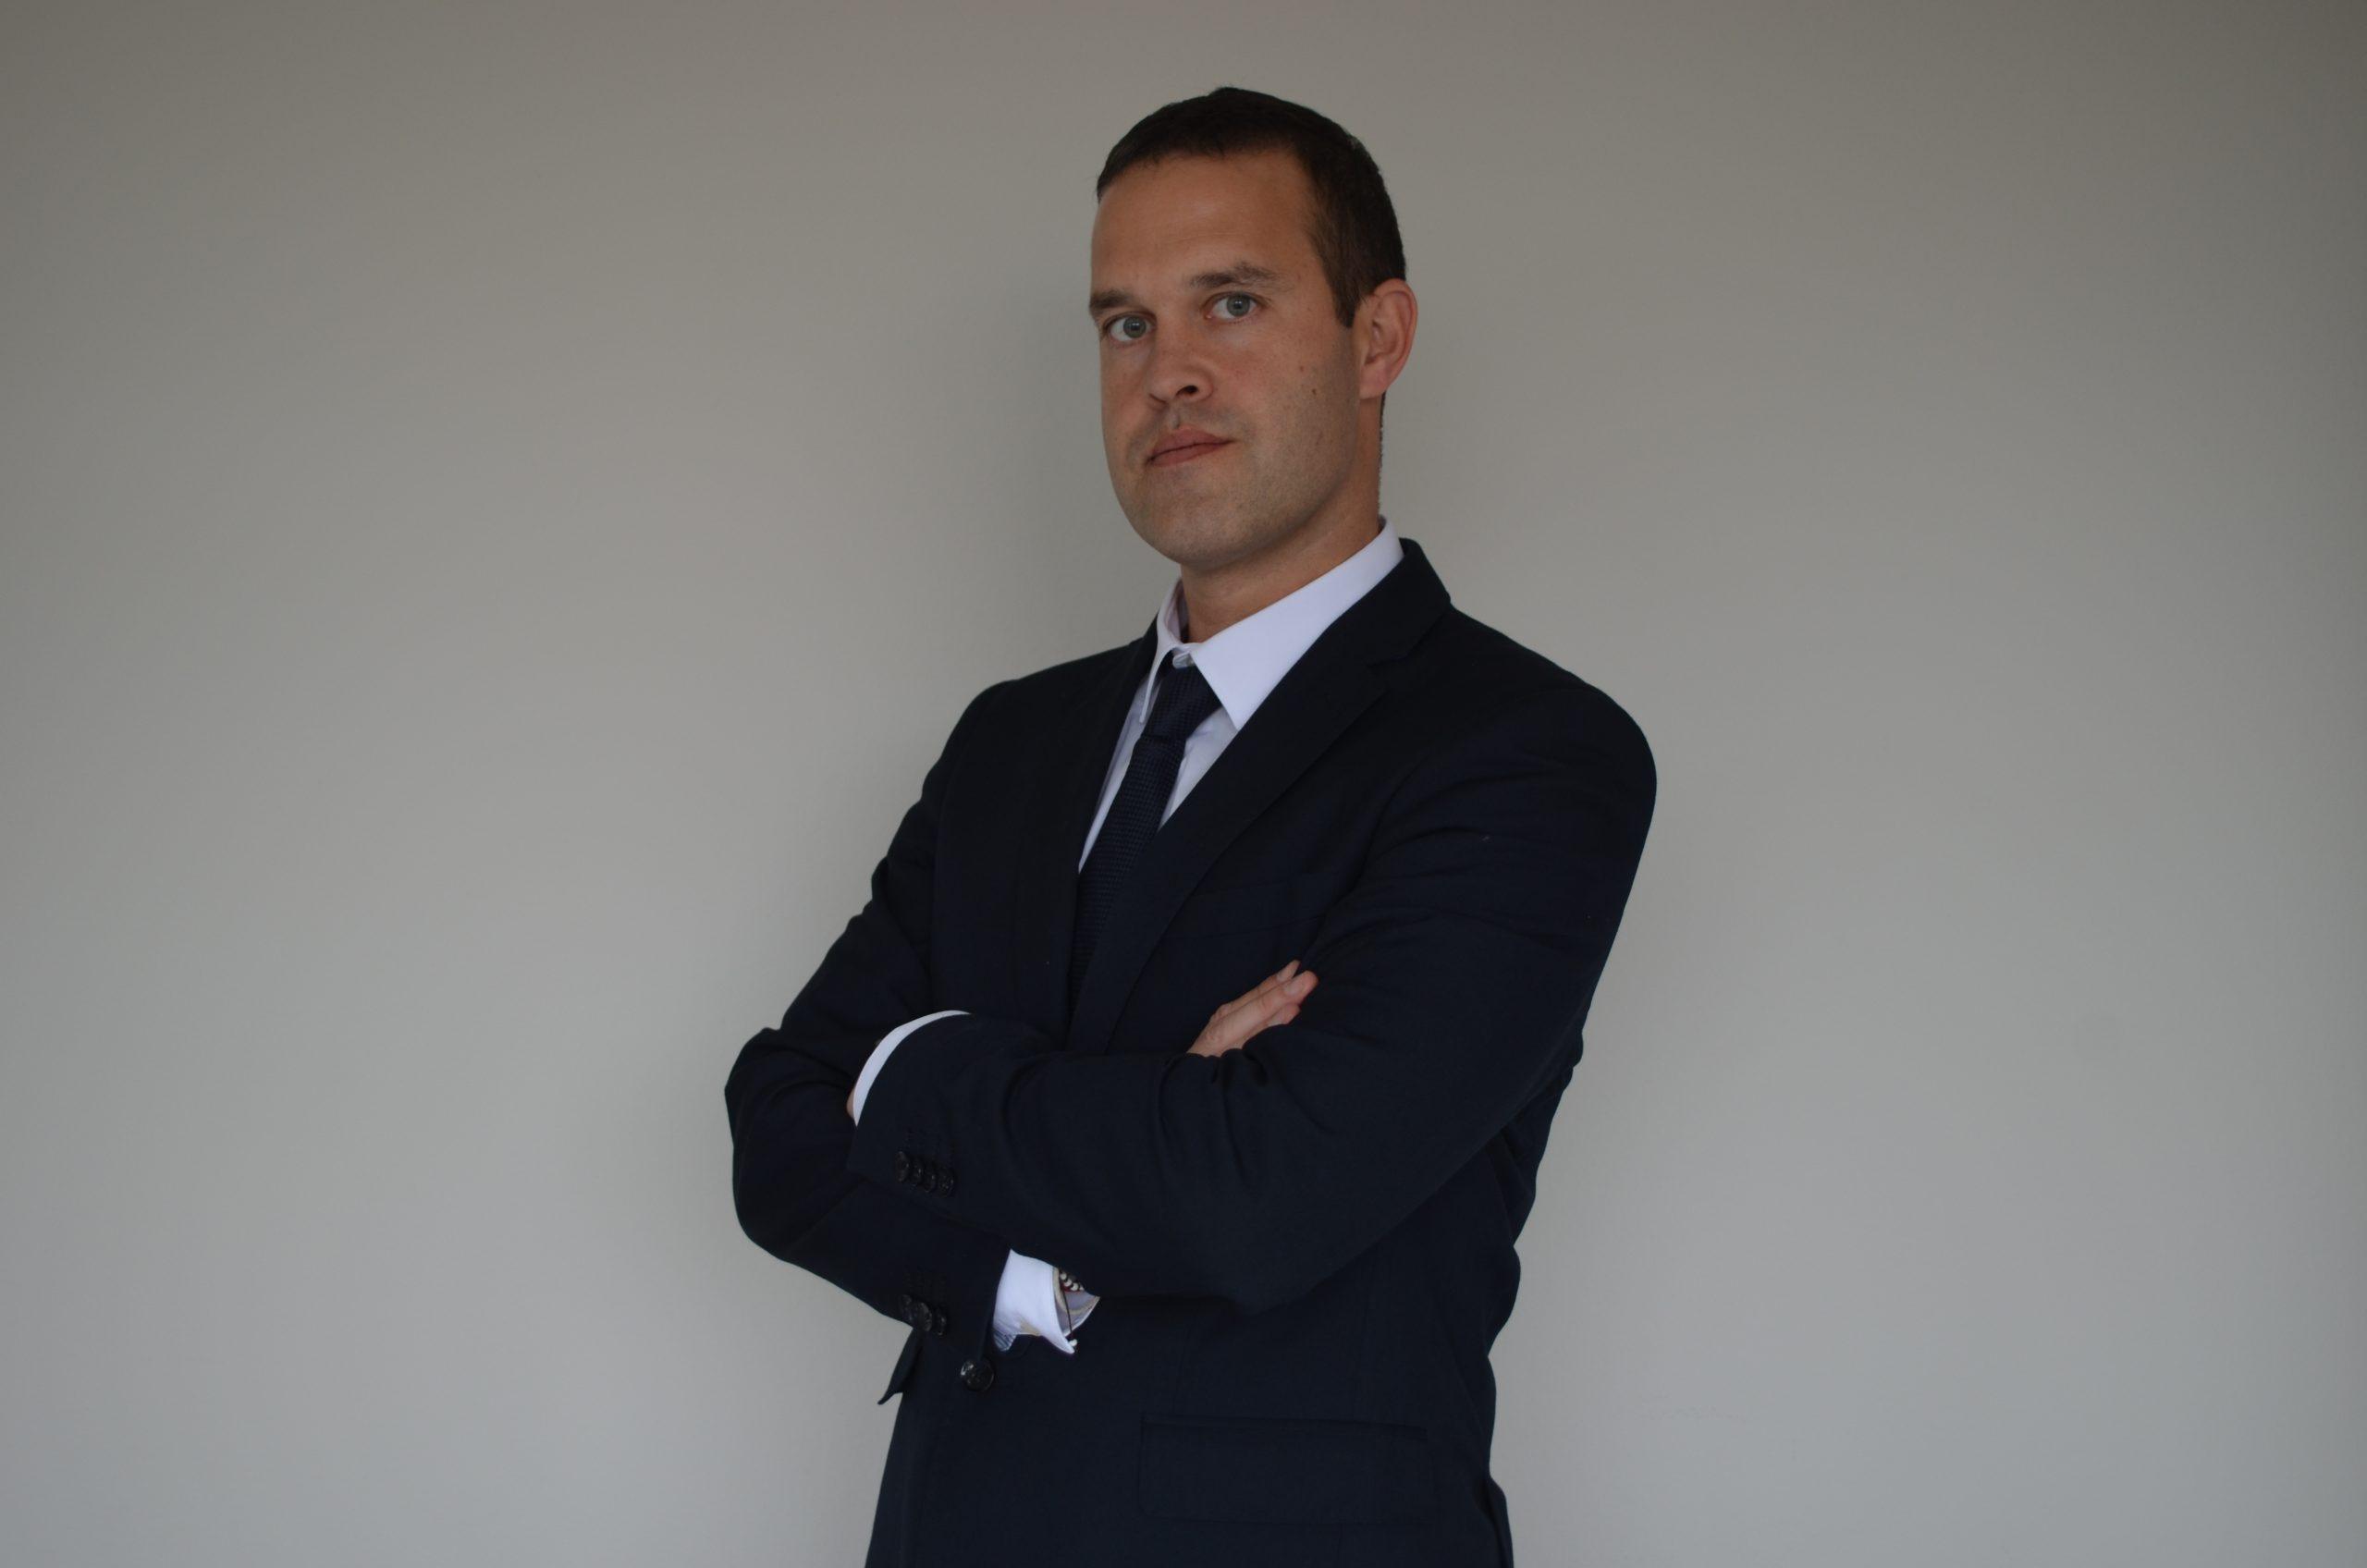 Advocat Girona Abogado Girona